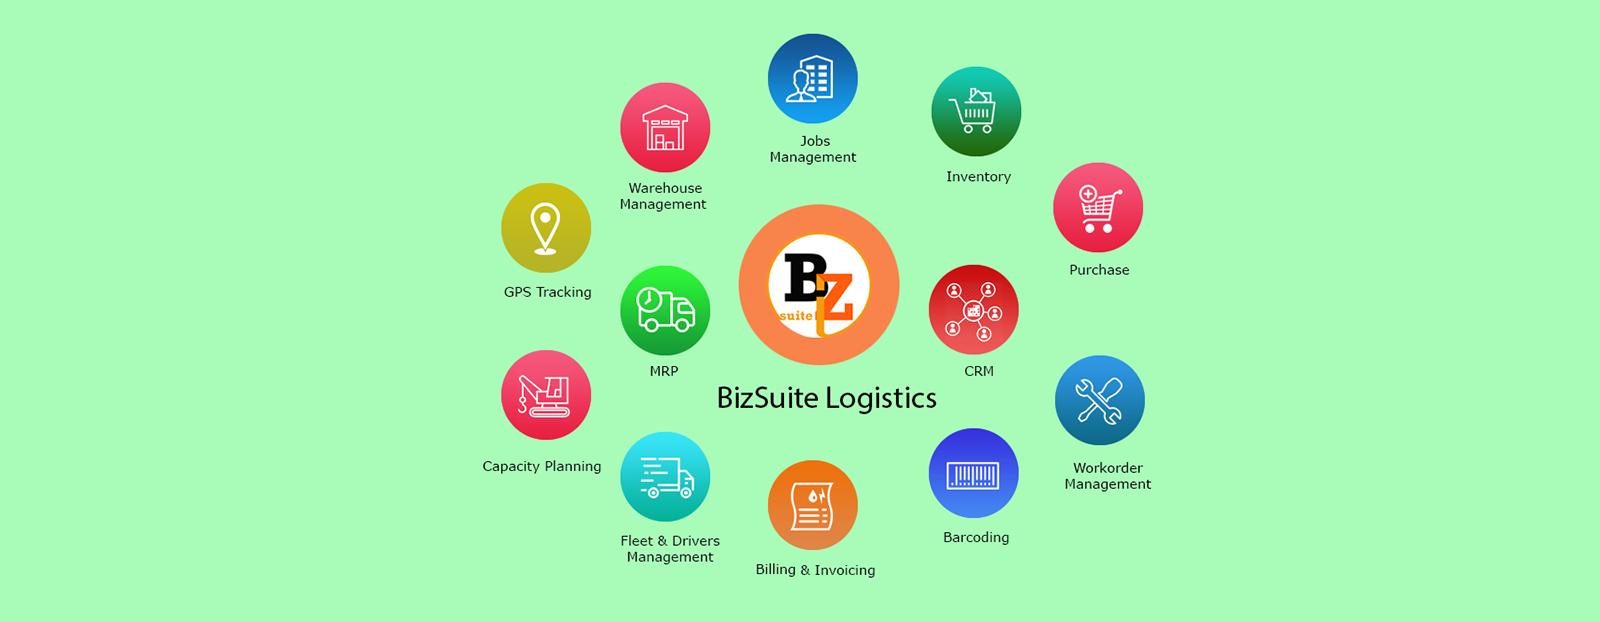 Bizsuite Logistics